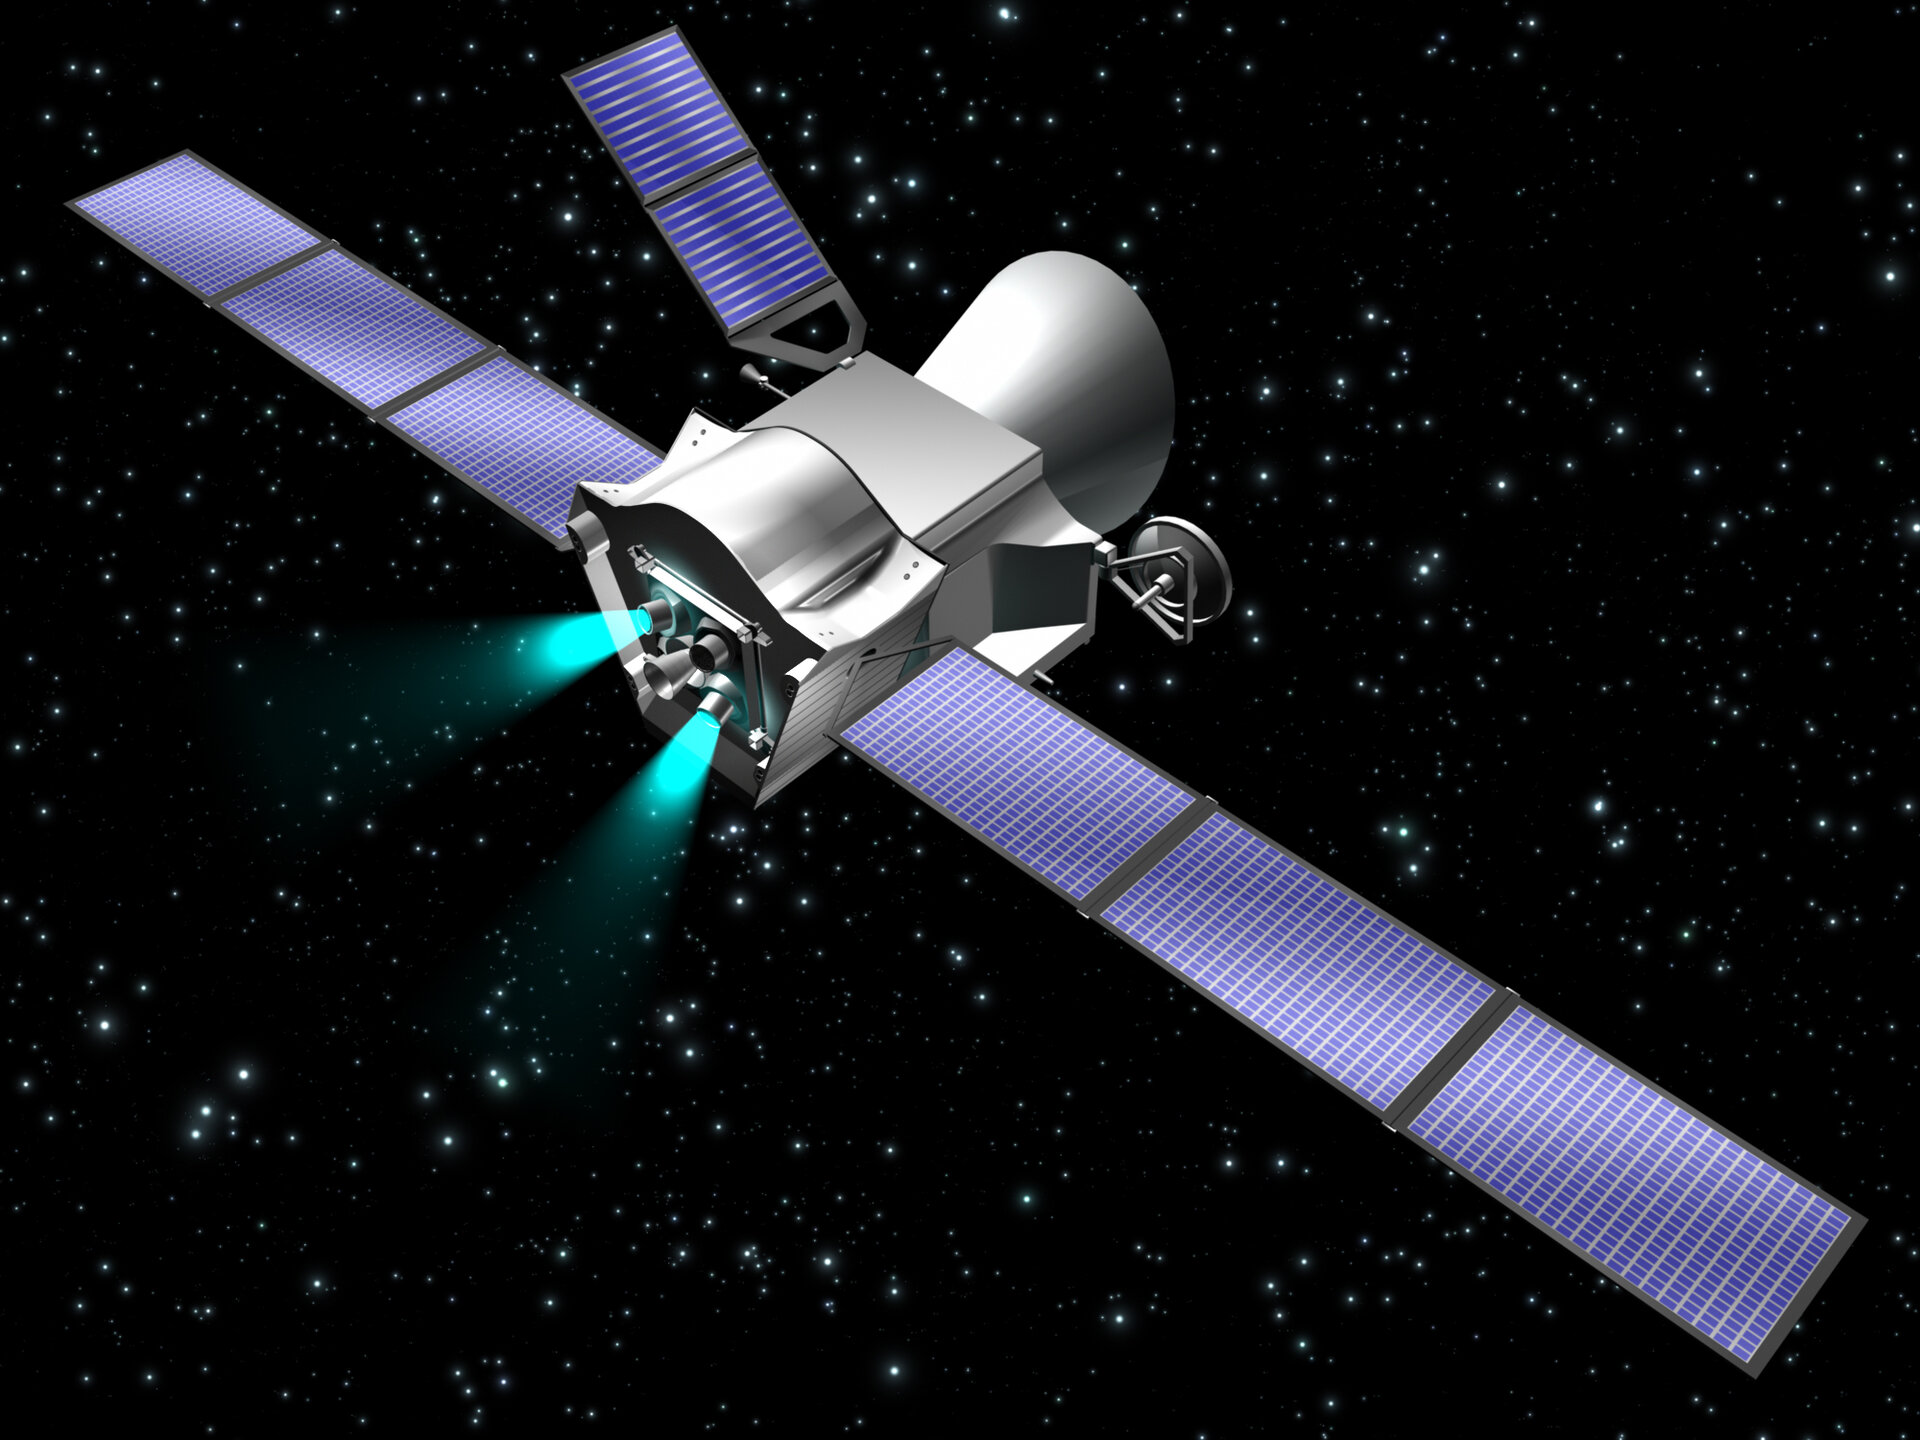 Esa Anatomy Of A Spacecraft